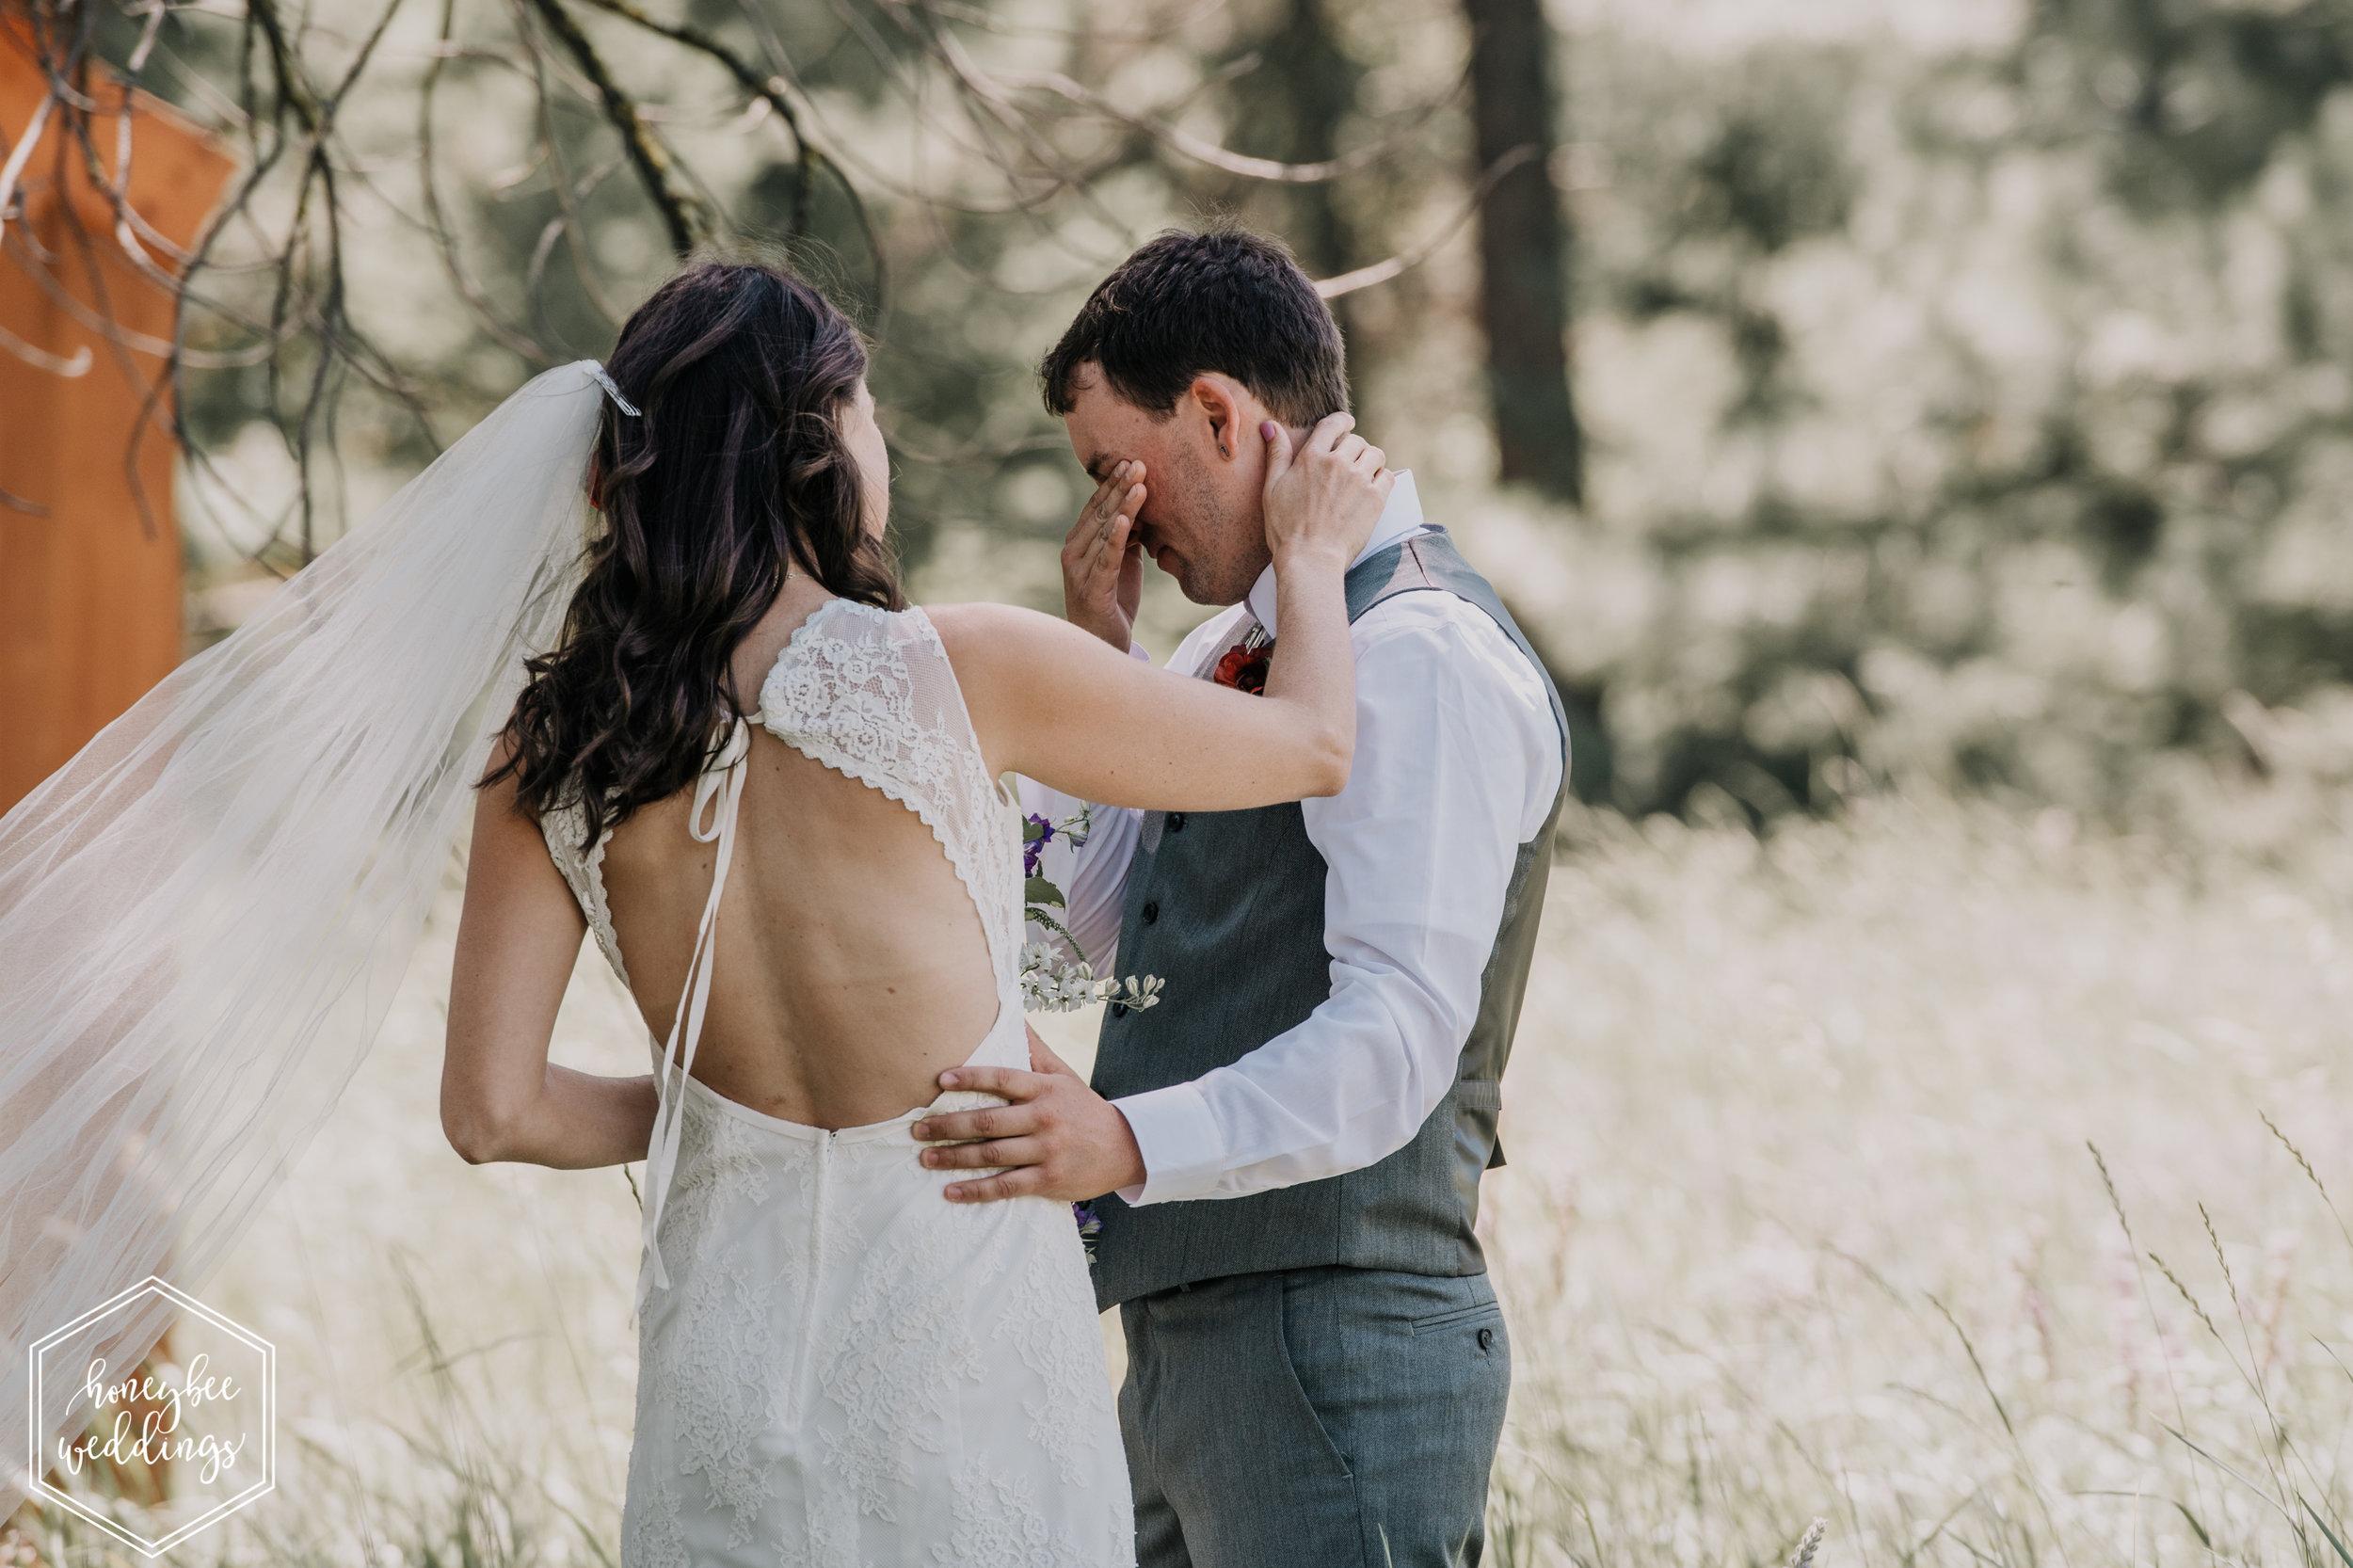 93 White Raven Wedding_Montana Wedding Photographer_Honeybee Weddings_ Meghan Maloney + Arza Hammond 2018-9224-2.jpg